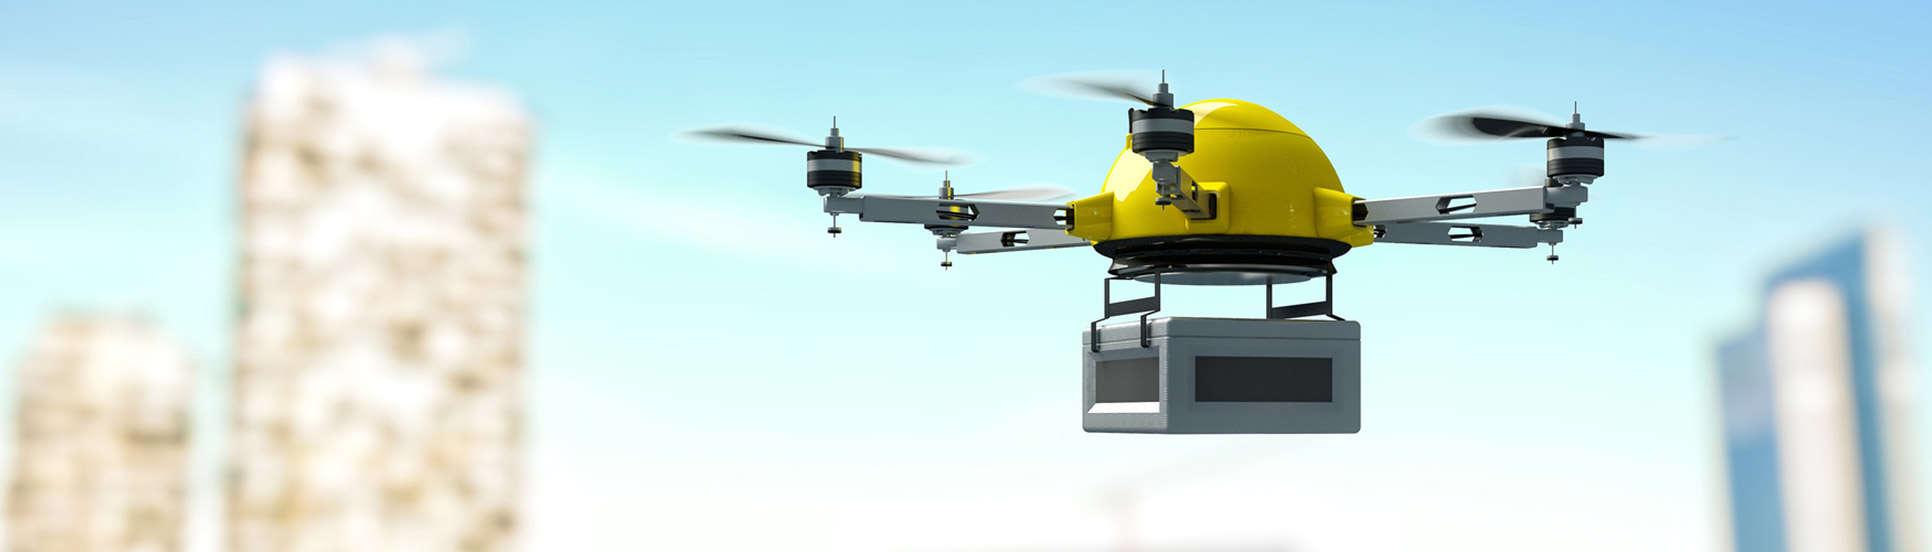 drone_slide_page_ok